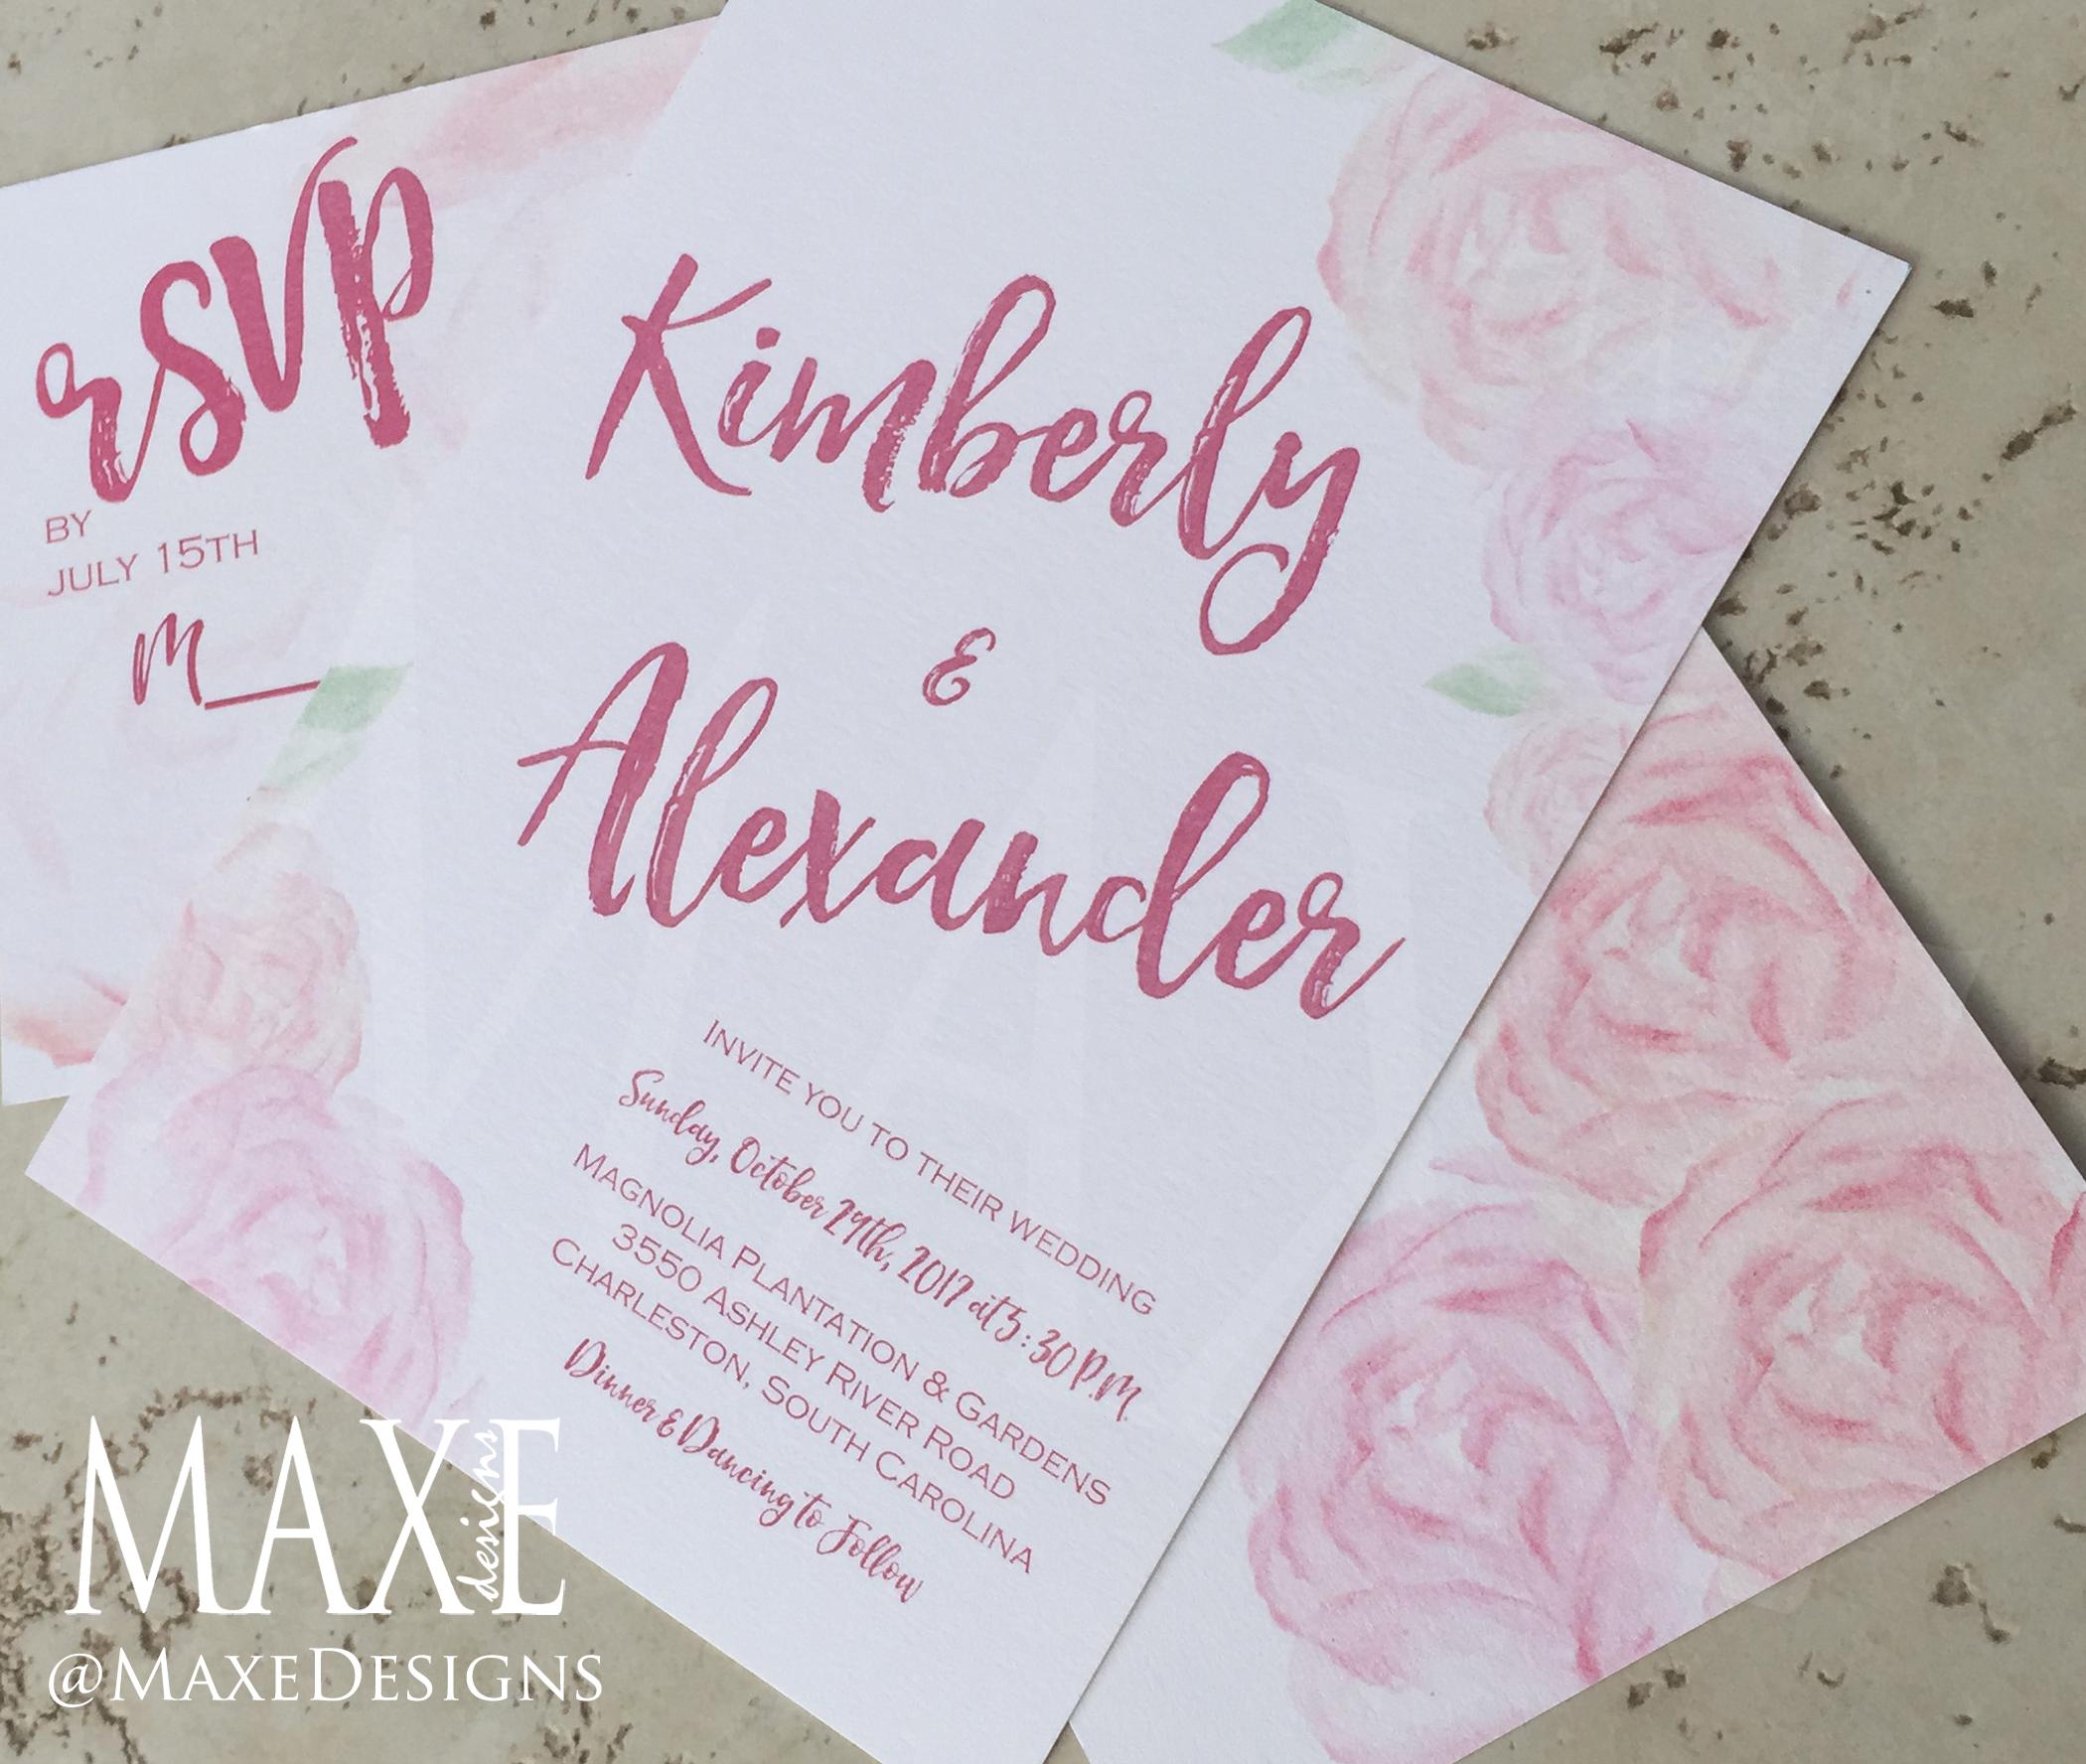 Kimberly & Alex 3 Maxe Designs.jpg